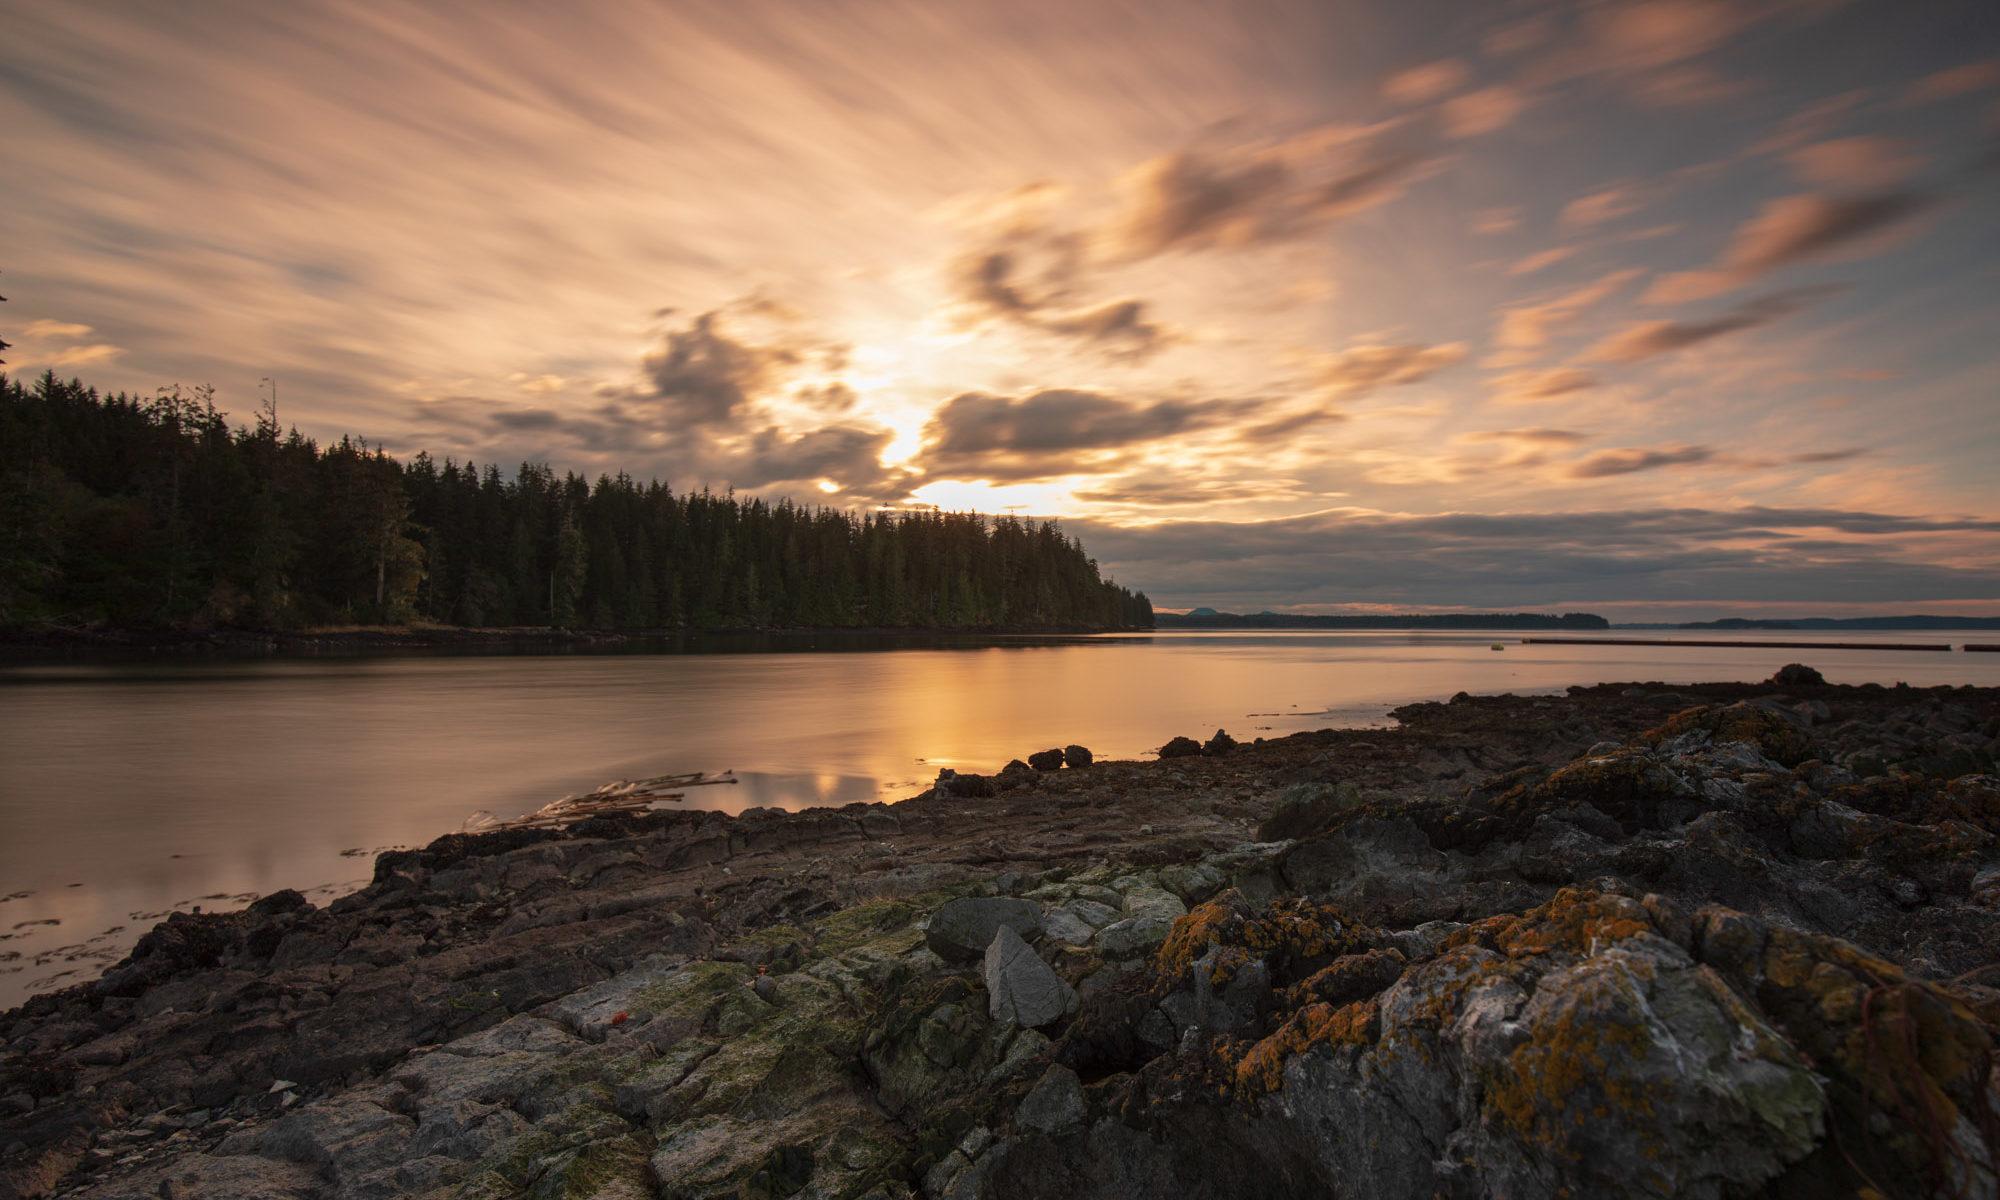 Sonnenuntergang in Alder Bay auf Vancouver Island